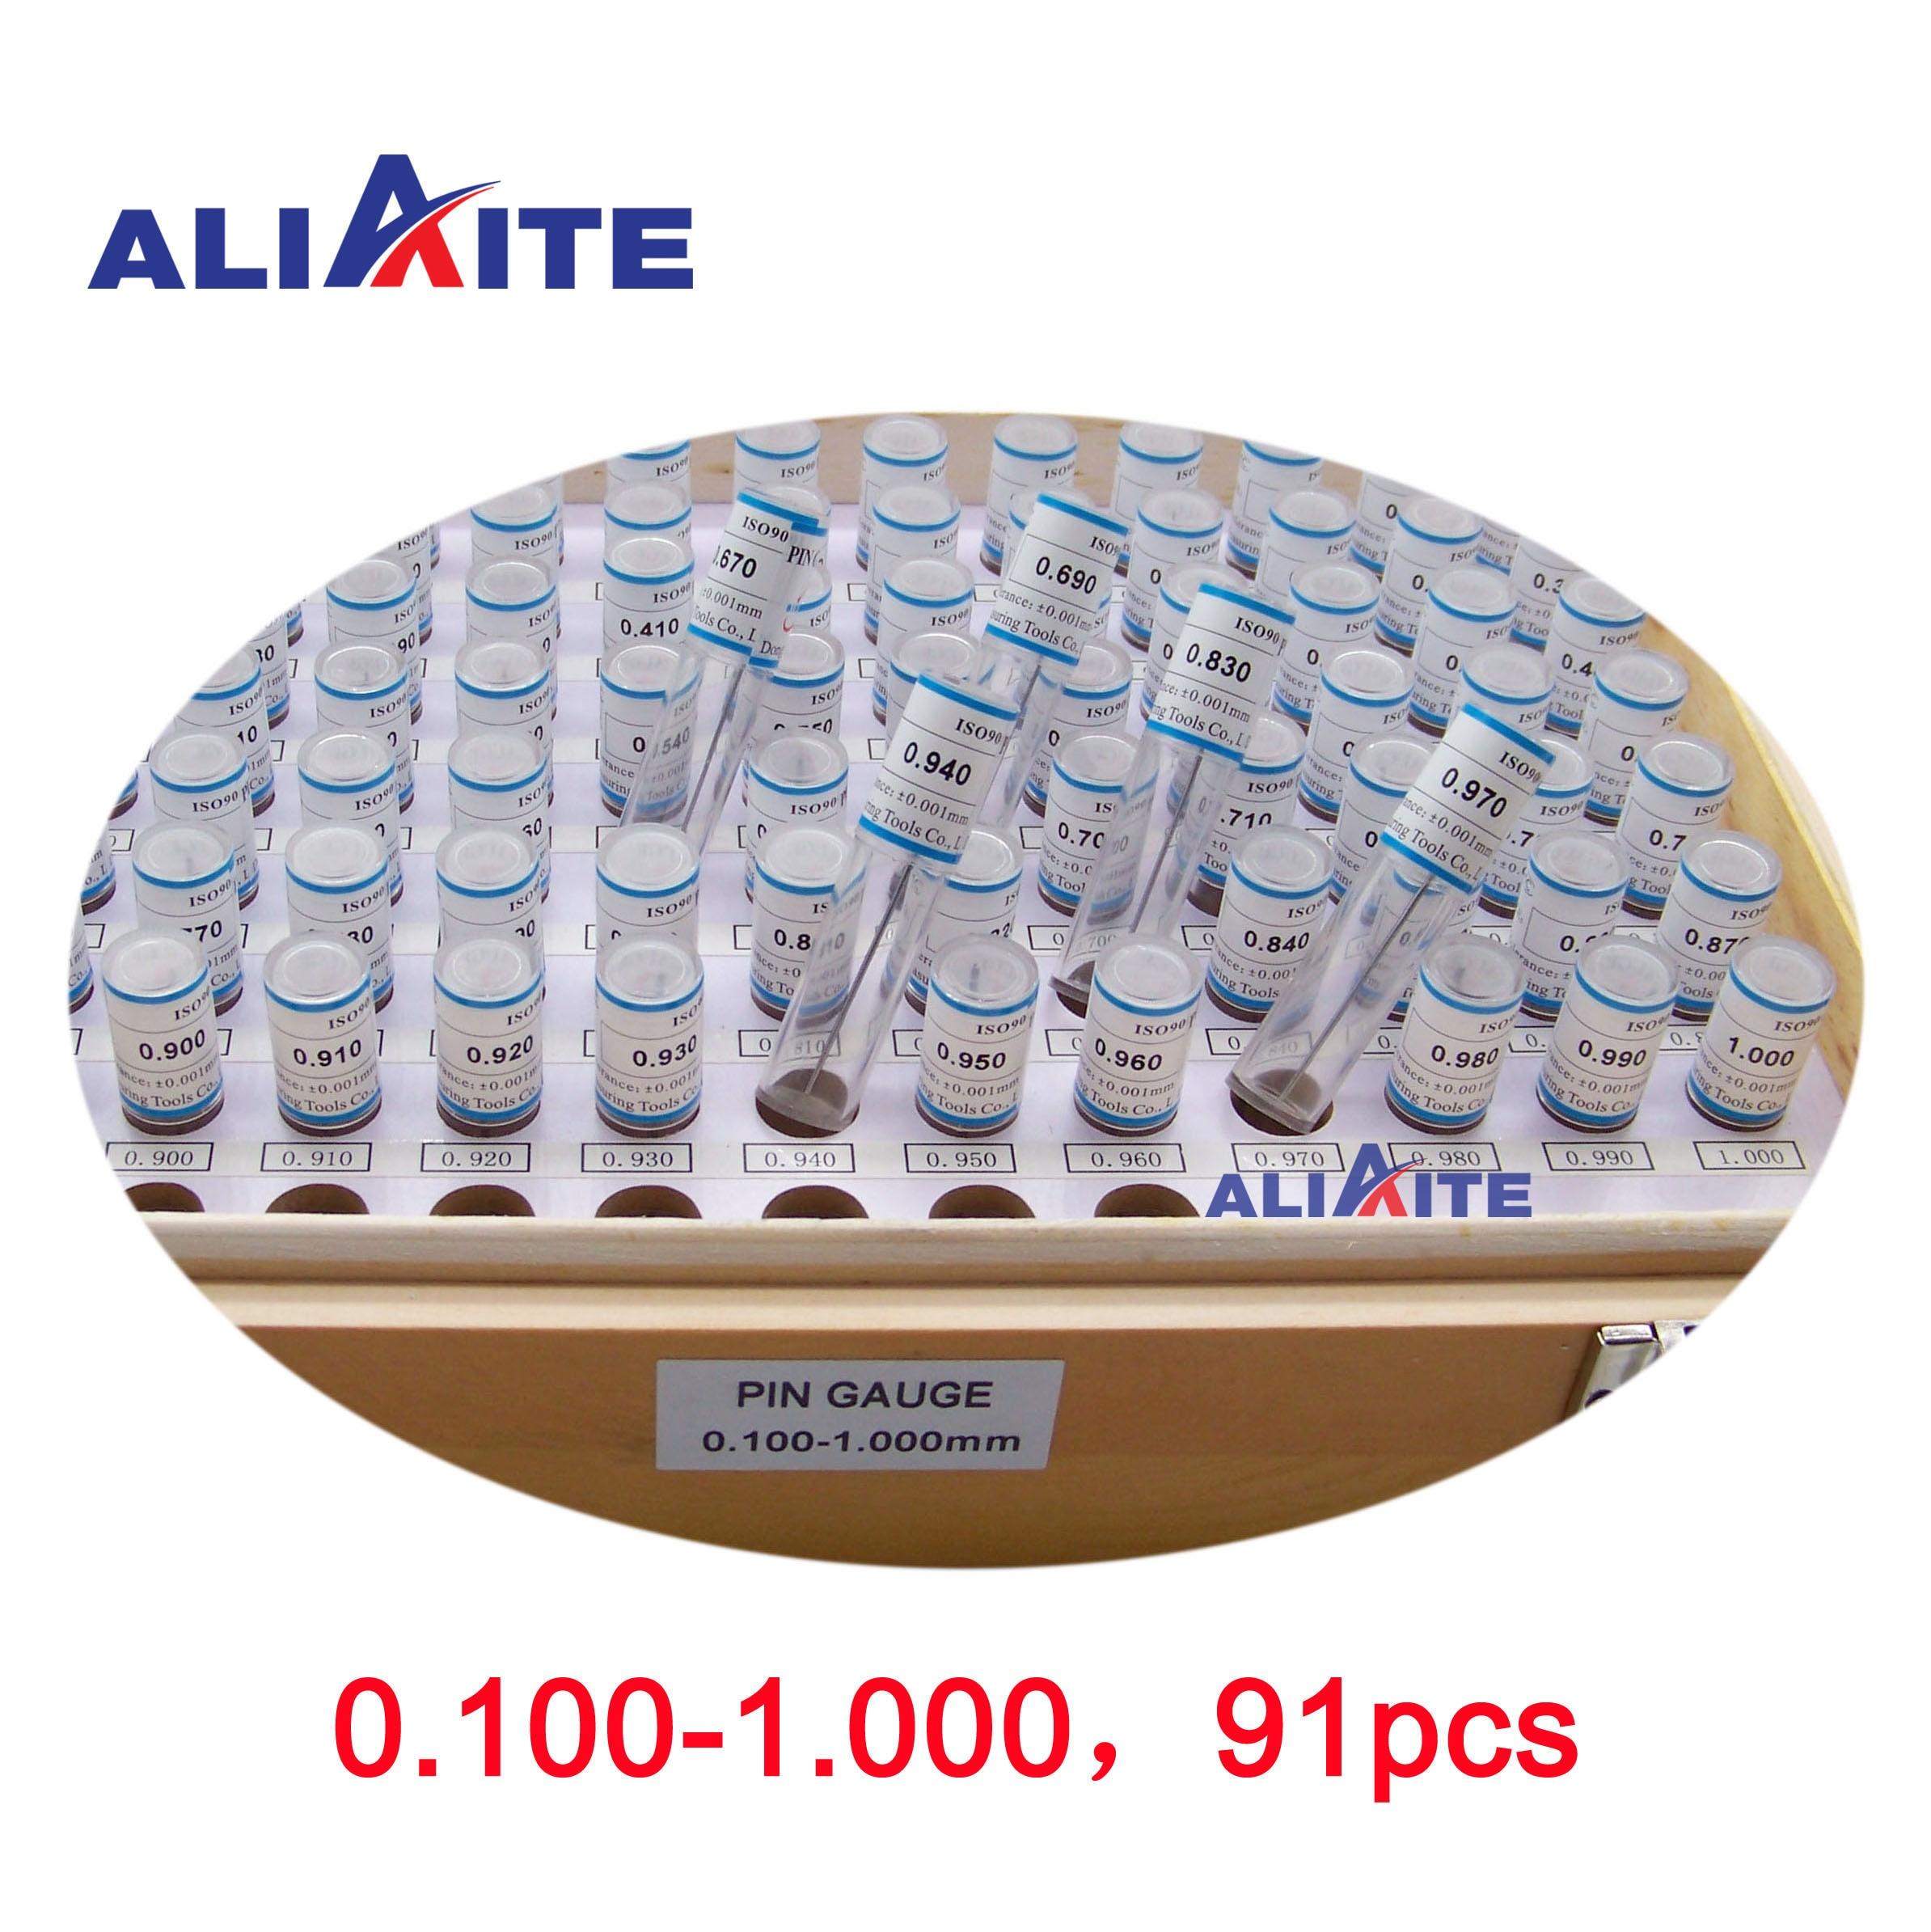 Conjunto de Calibre de Pino Passo: Pces Aliaite Pino Plug Gauge 0.100-1.000 0.0191